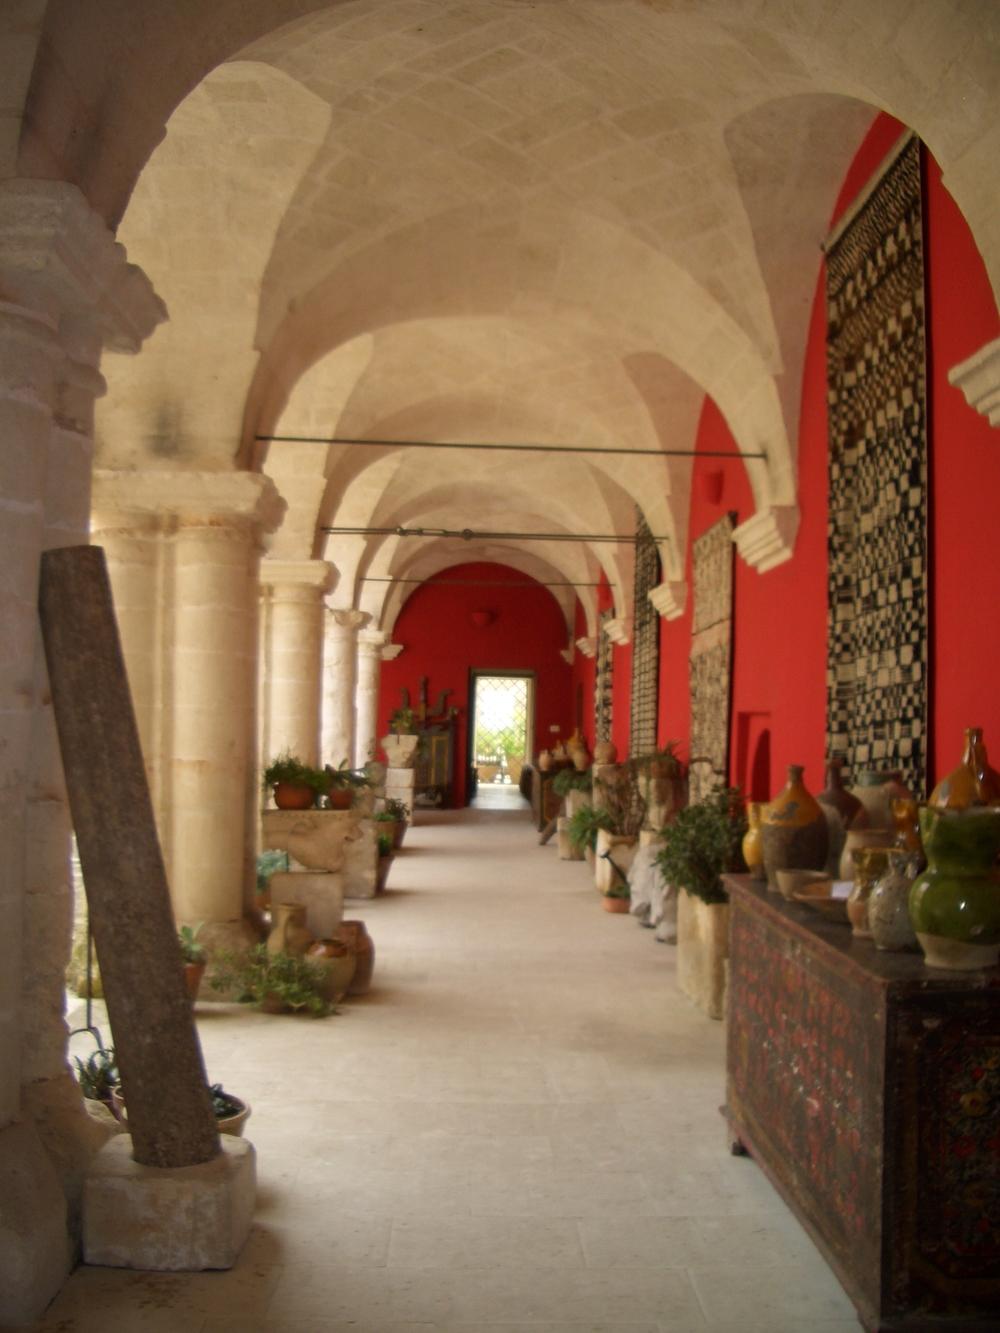 Convento-3.JPG